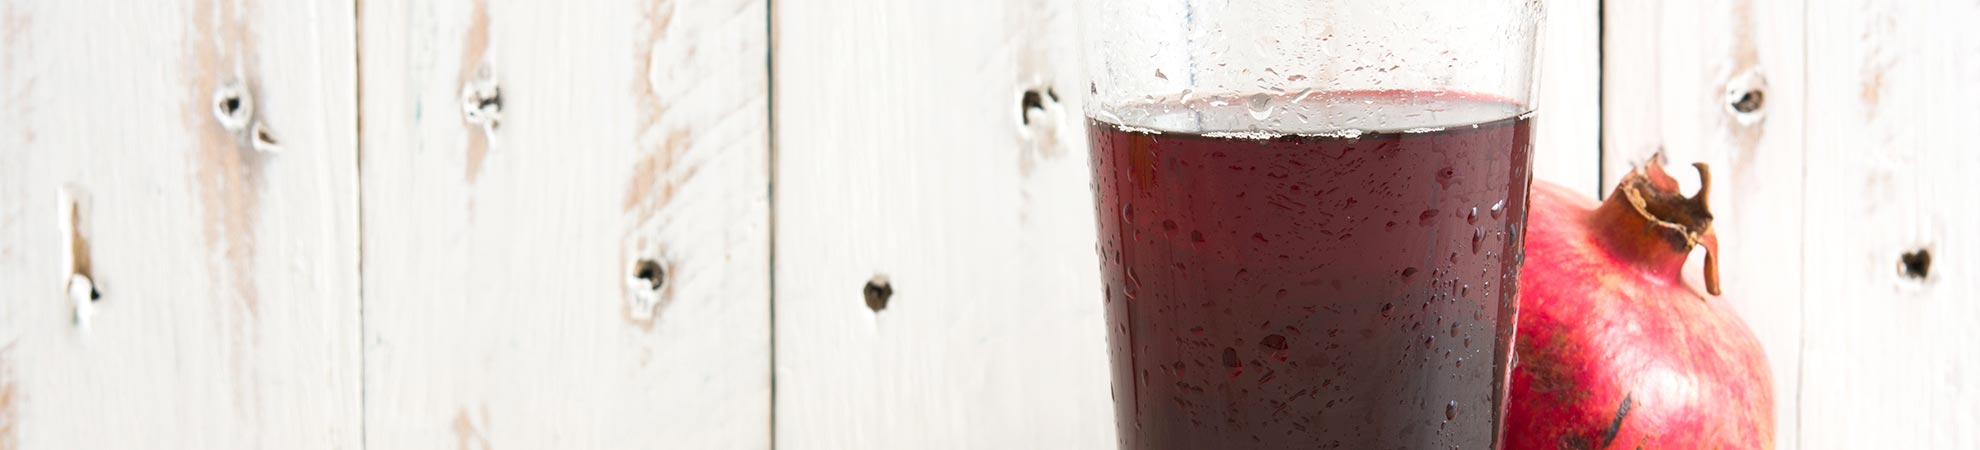 detox-depurativo-fruta-granada